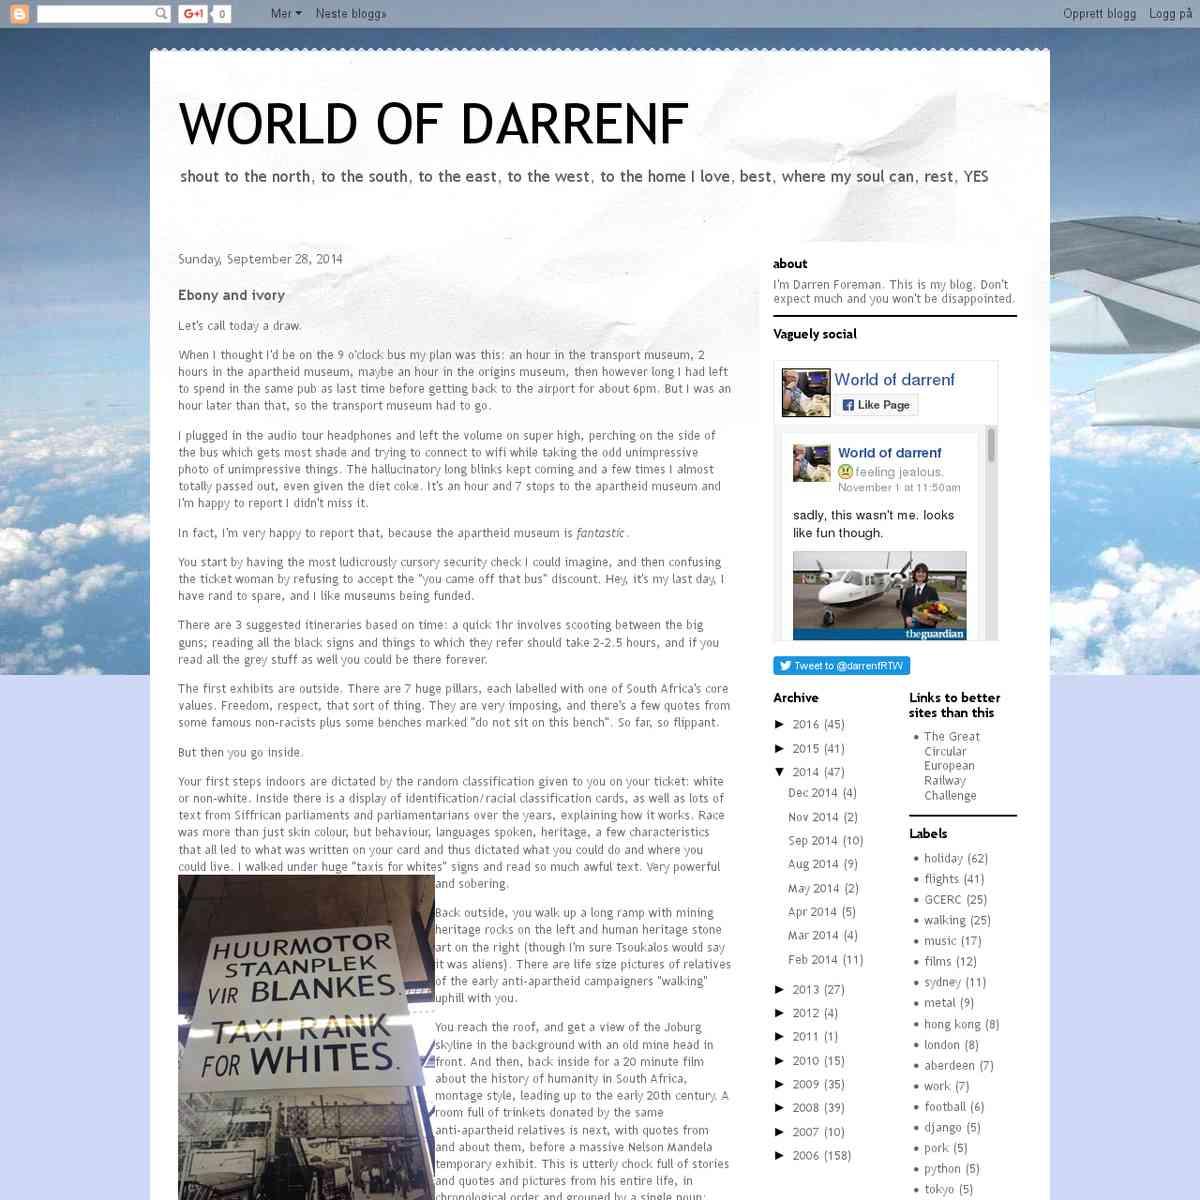 blog.darrenf.org/2014/09/ebony-and-ivory.html